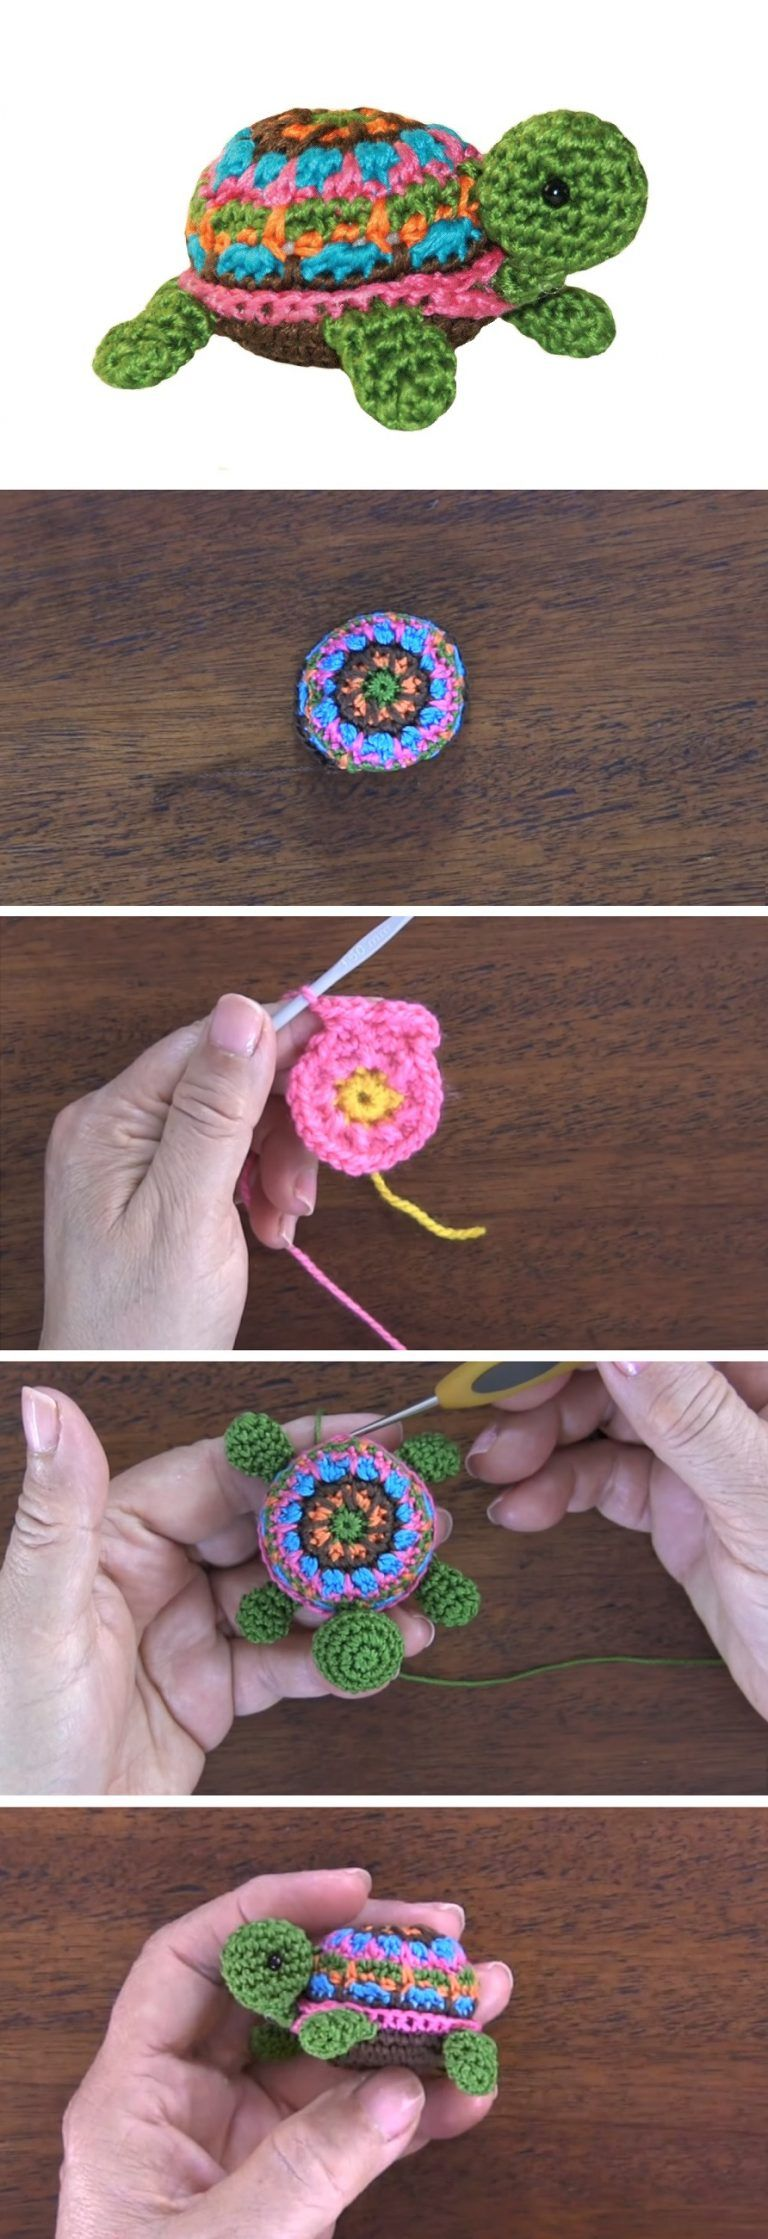 Crochet Turtle Tutorial – Handmade paris #crochetturtles